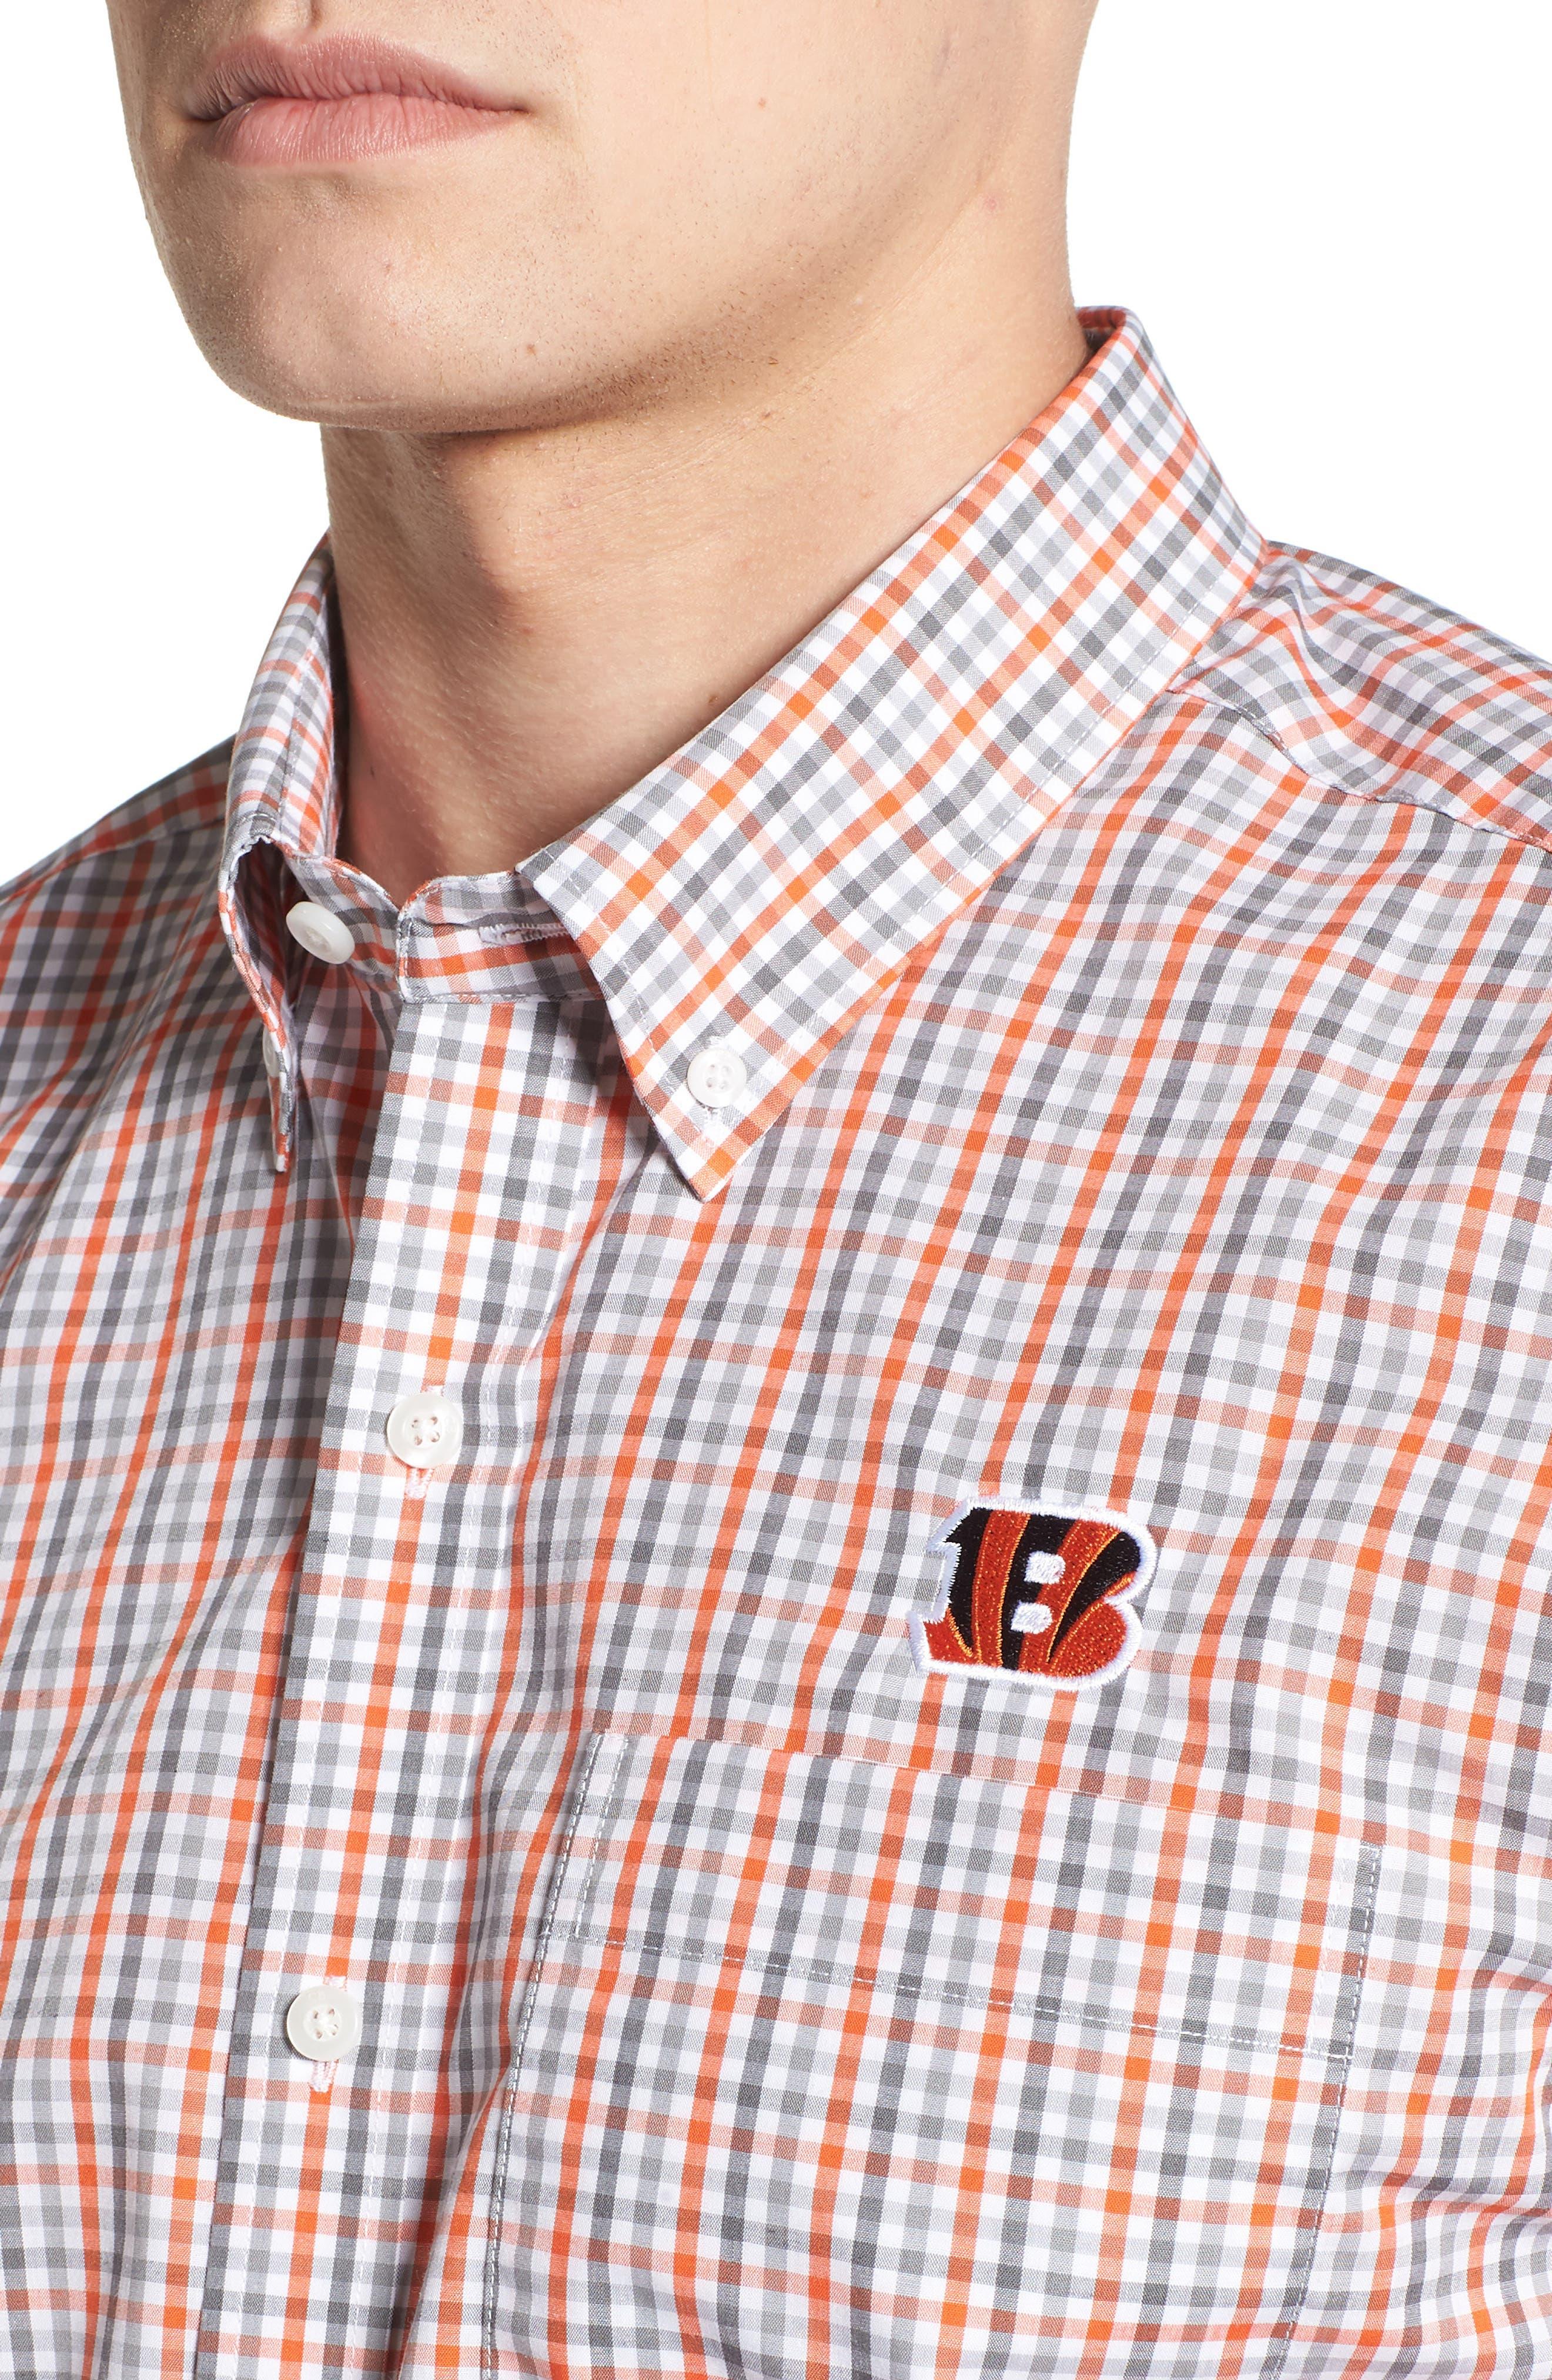 Cincinnati Bengals - Gilman Regular Fit Plaid Sport Shirt,                             Alternate thumbnail 4, color,                             COLLEGE ORANGE